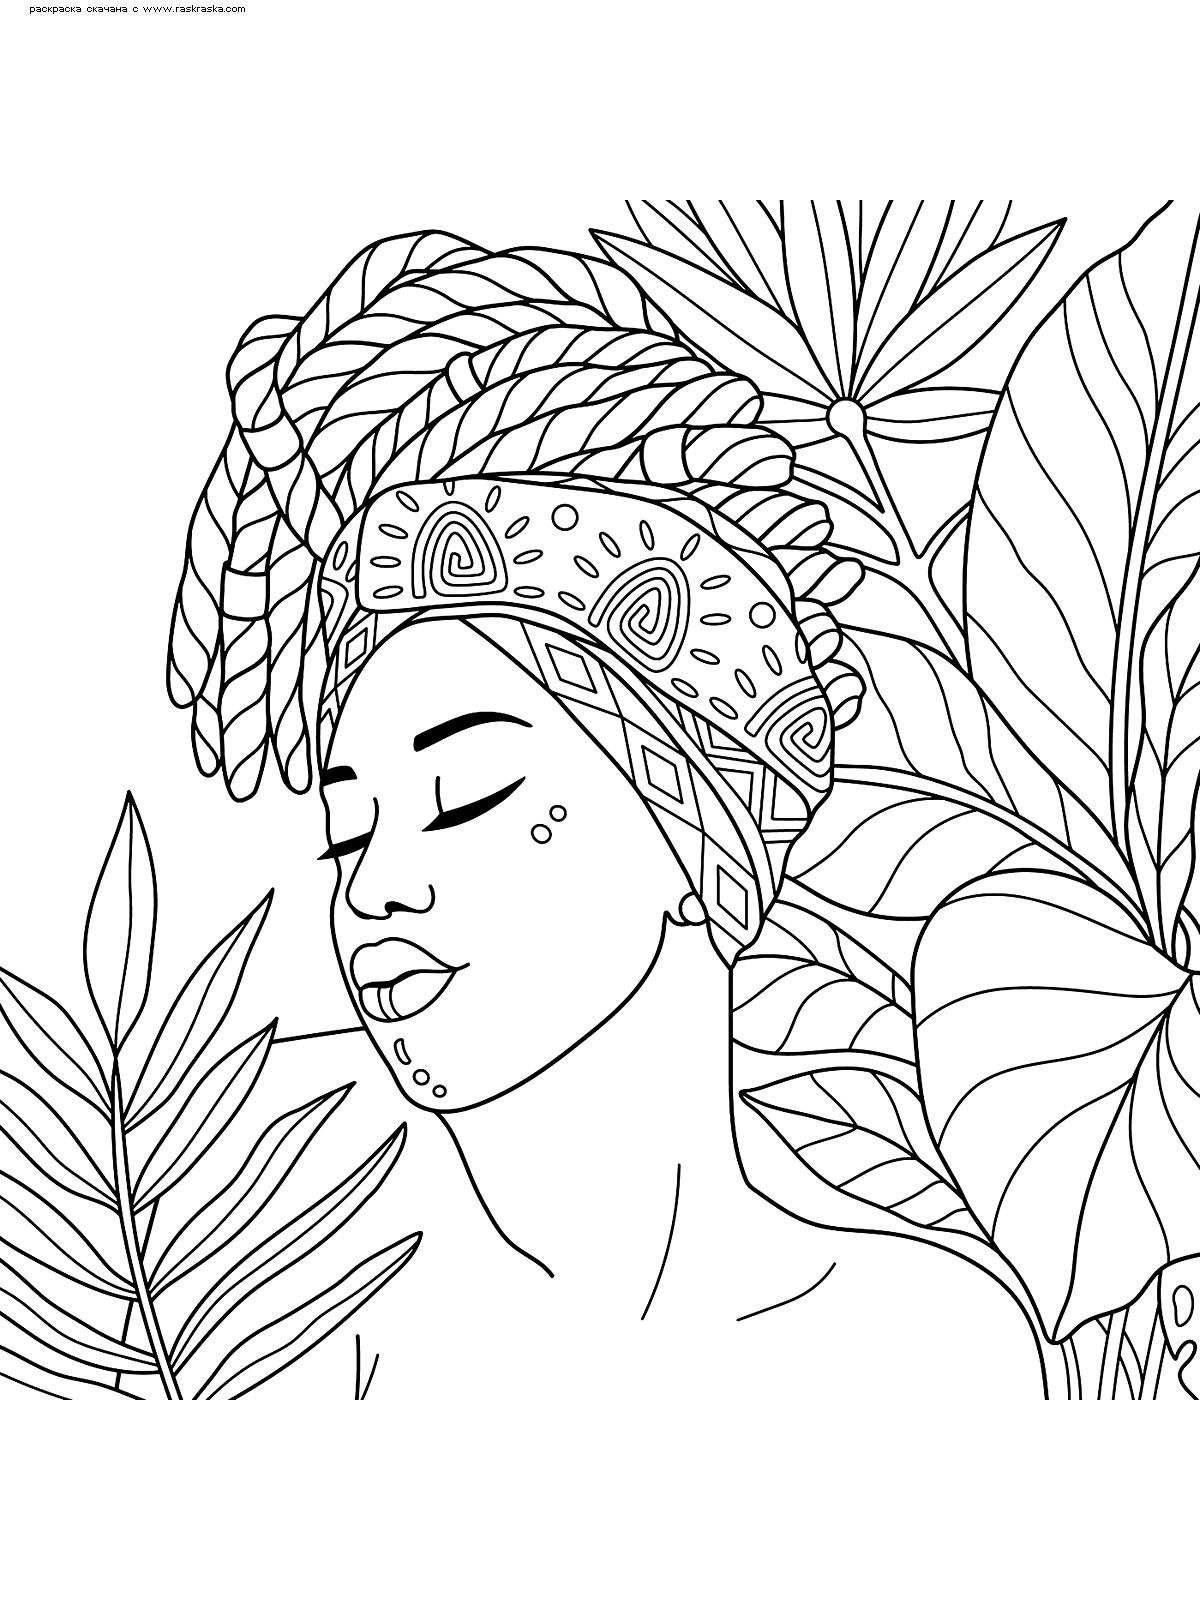 Раскраска Африканка. Раскраска антистресс